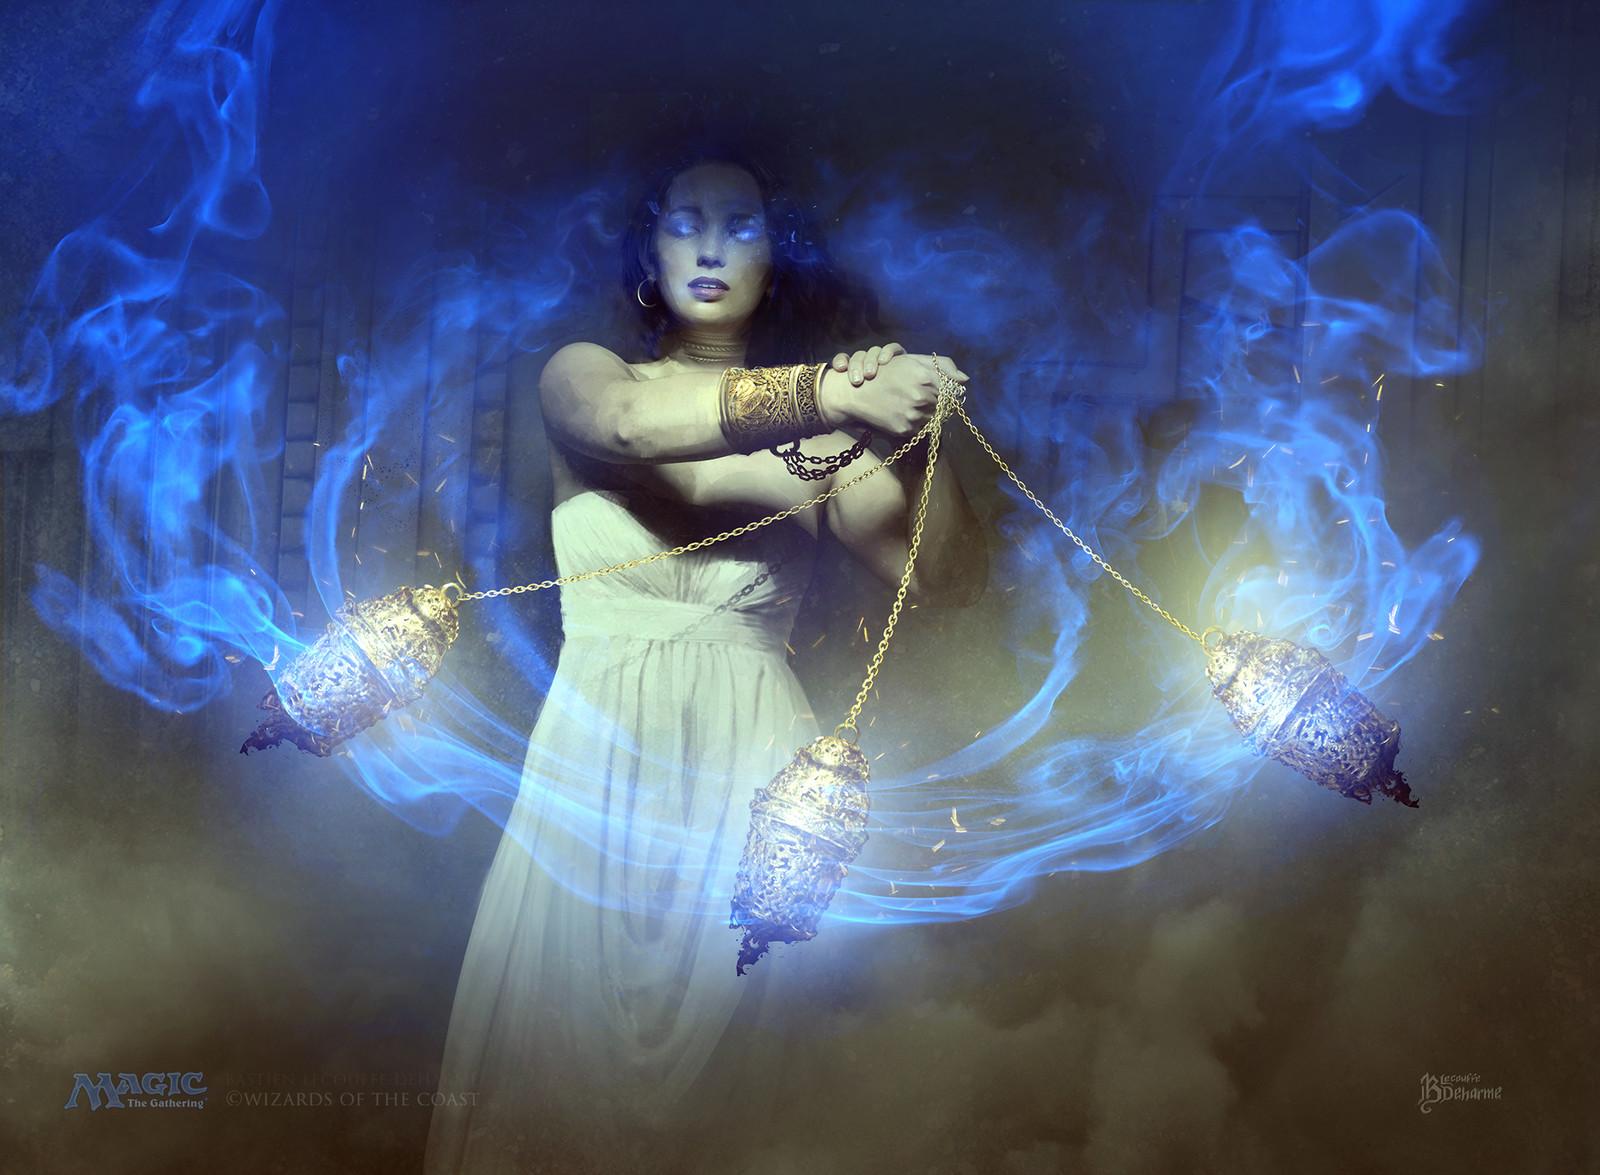 REVIVING VAPORS / Magic: the Gathering